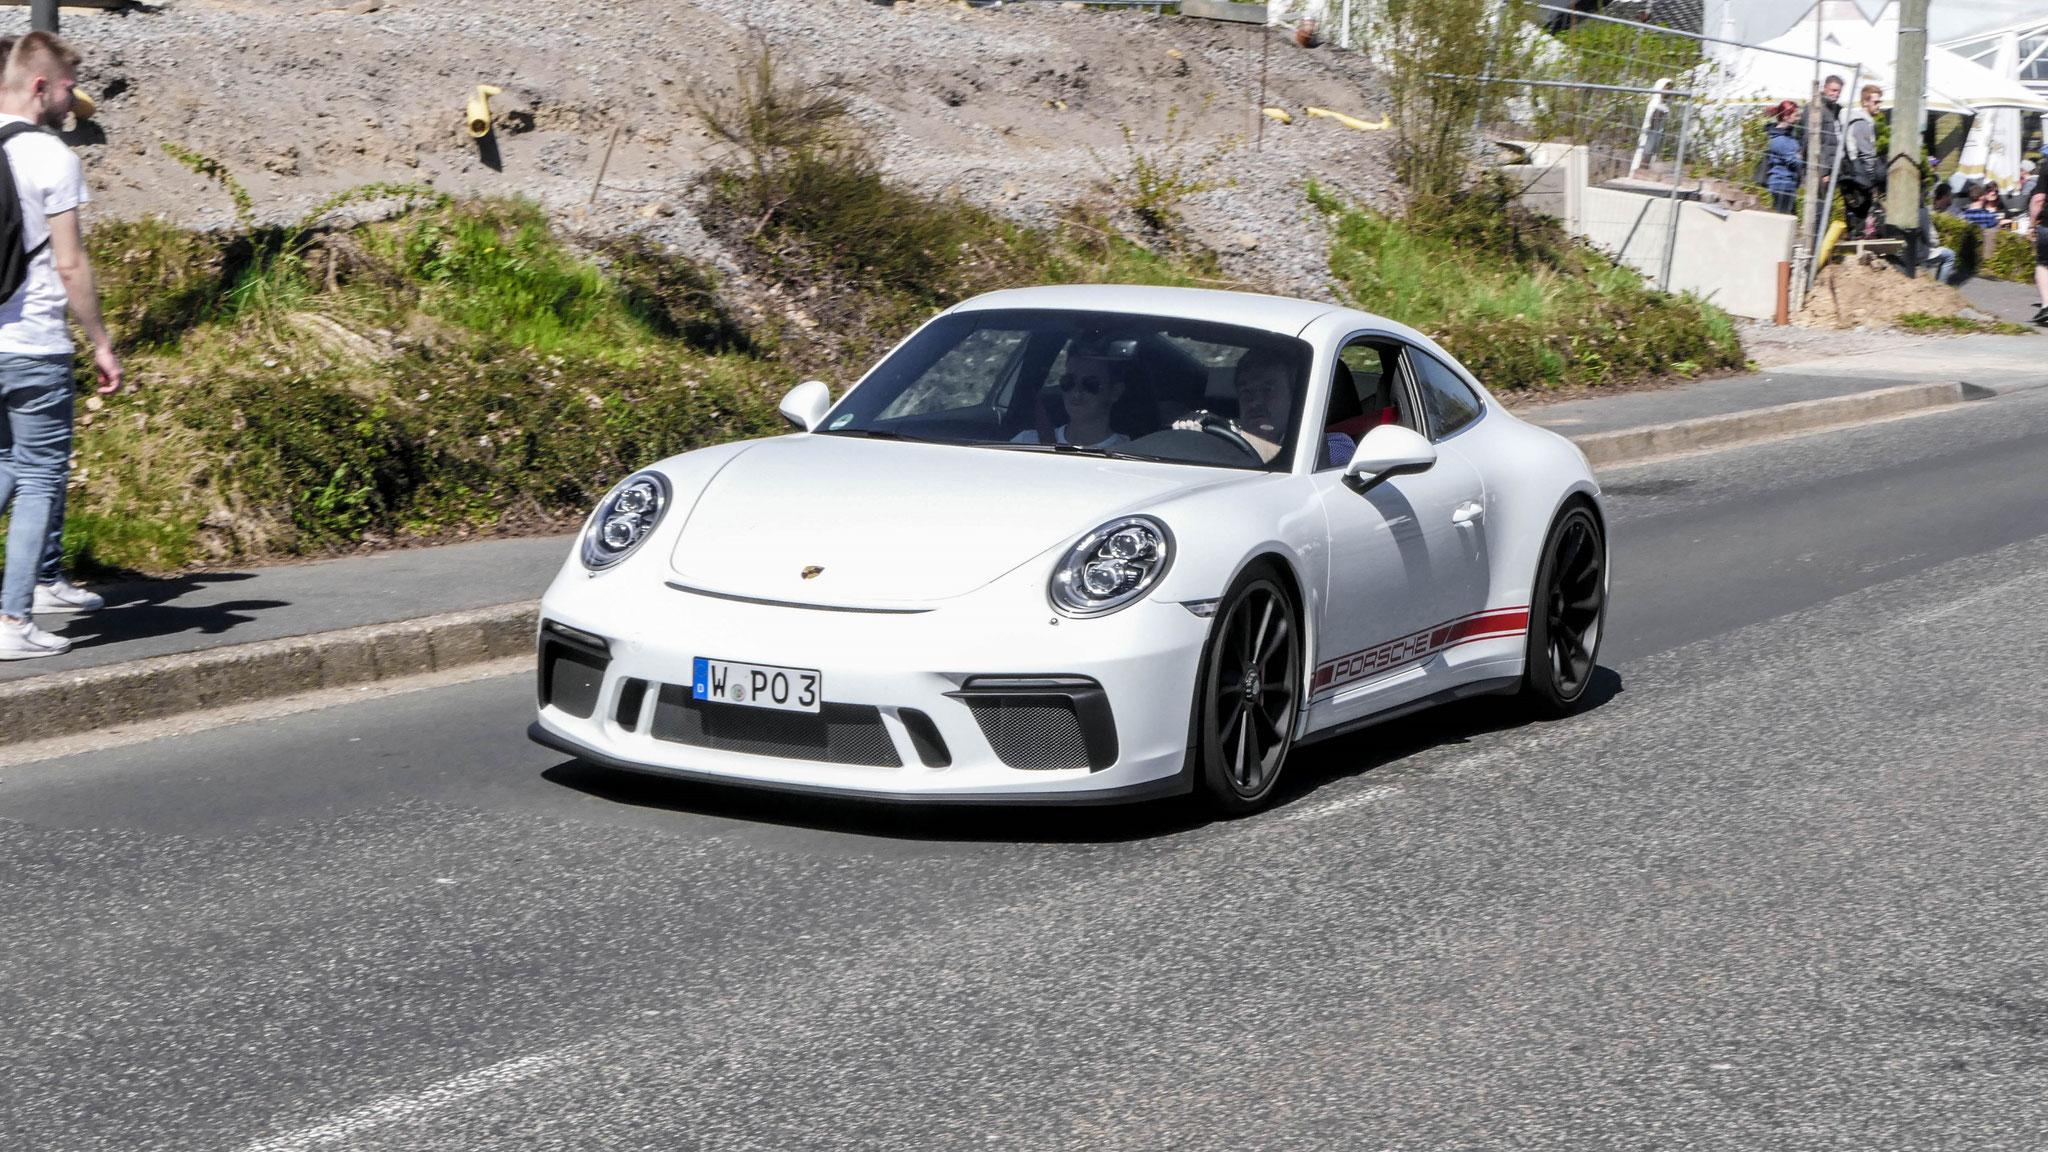 Porsche 991 GT3 Touring Package - W-PO-3